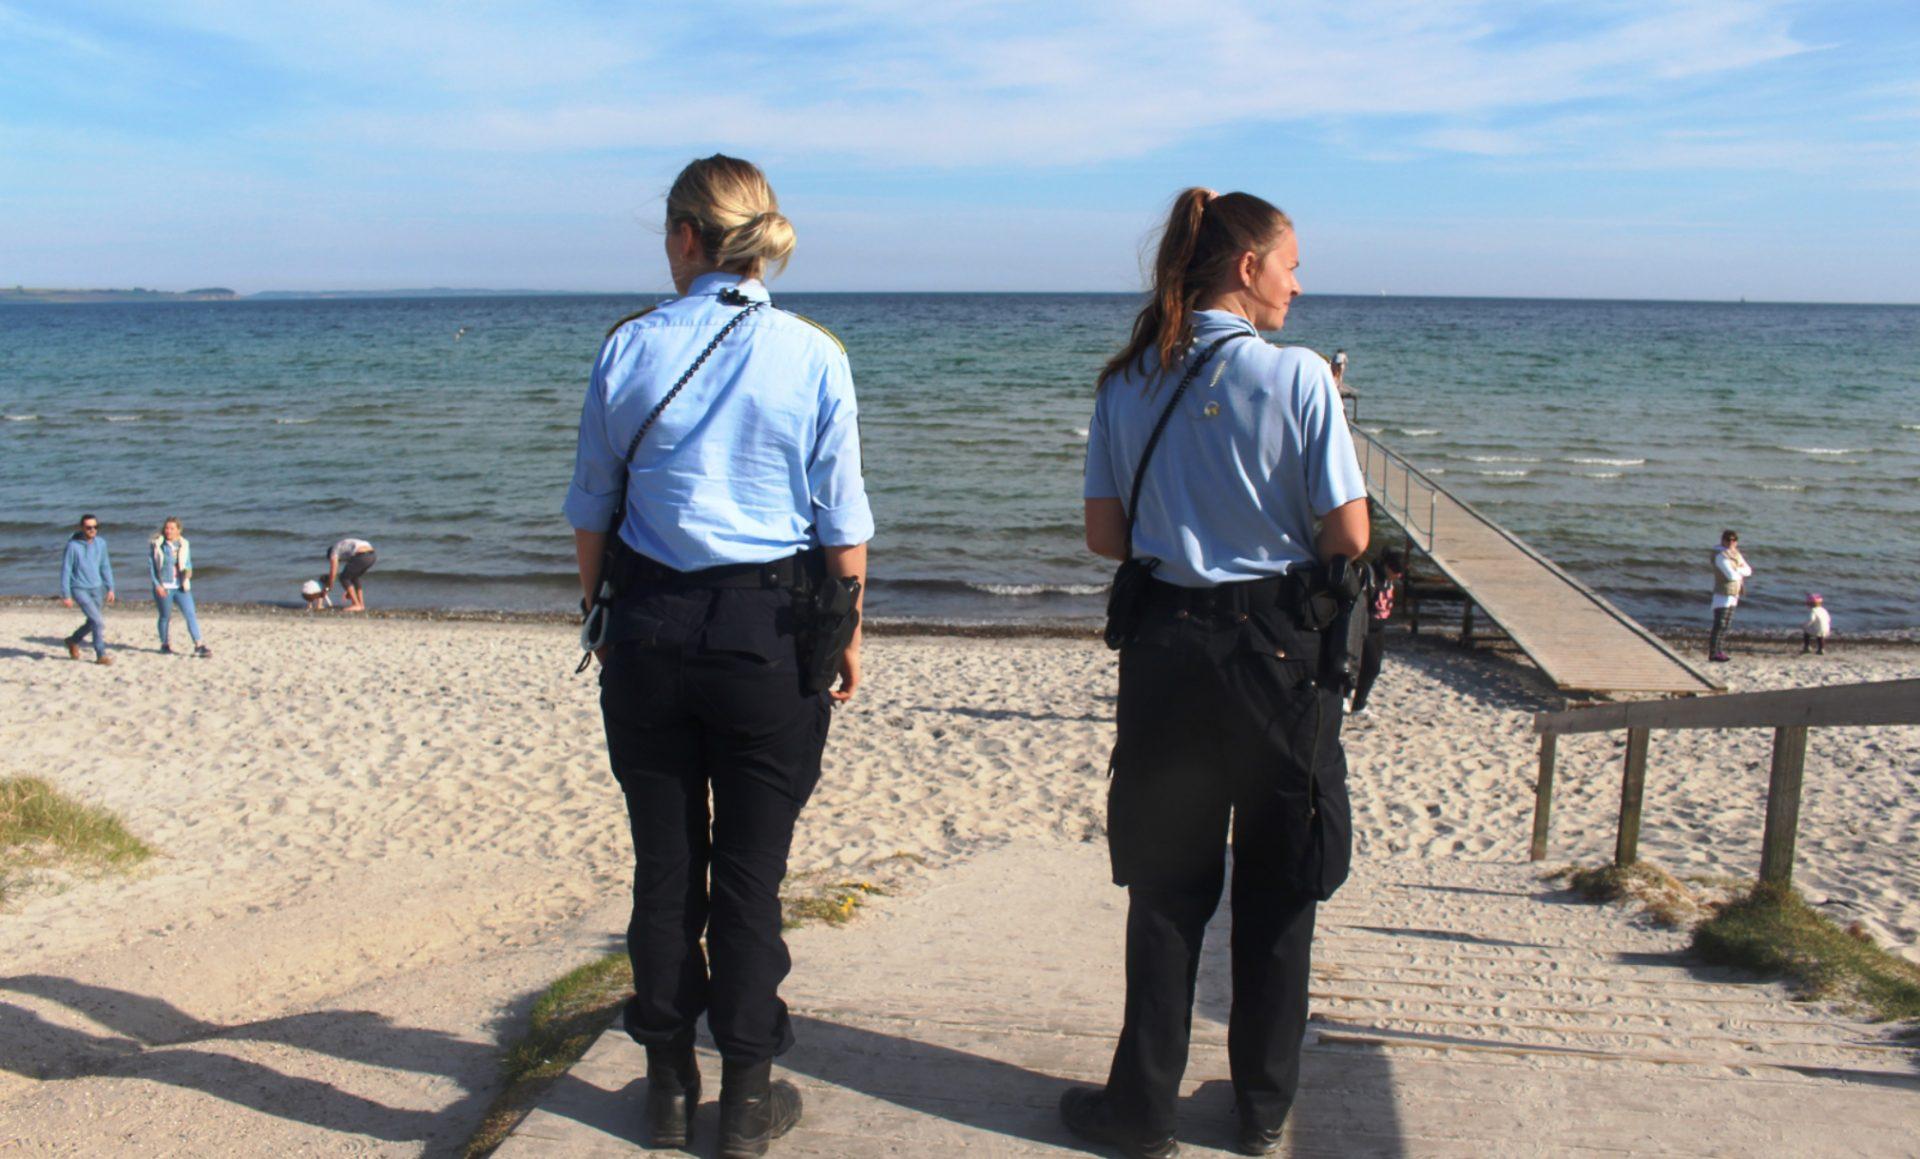 COVID-19: Østjyllands Politi opretter tre hotspots i Aarhus